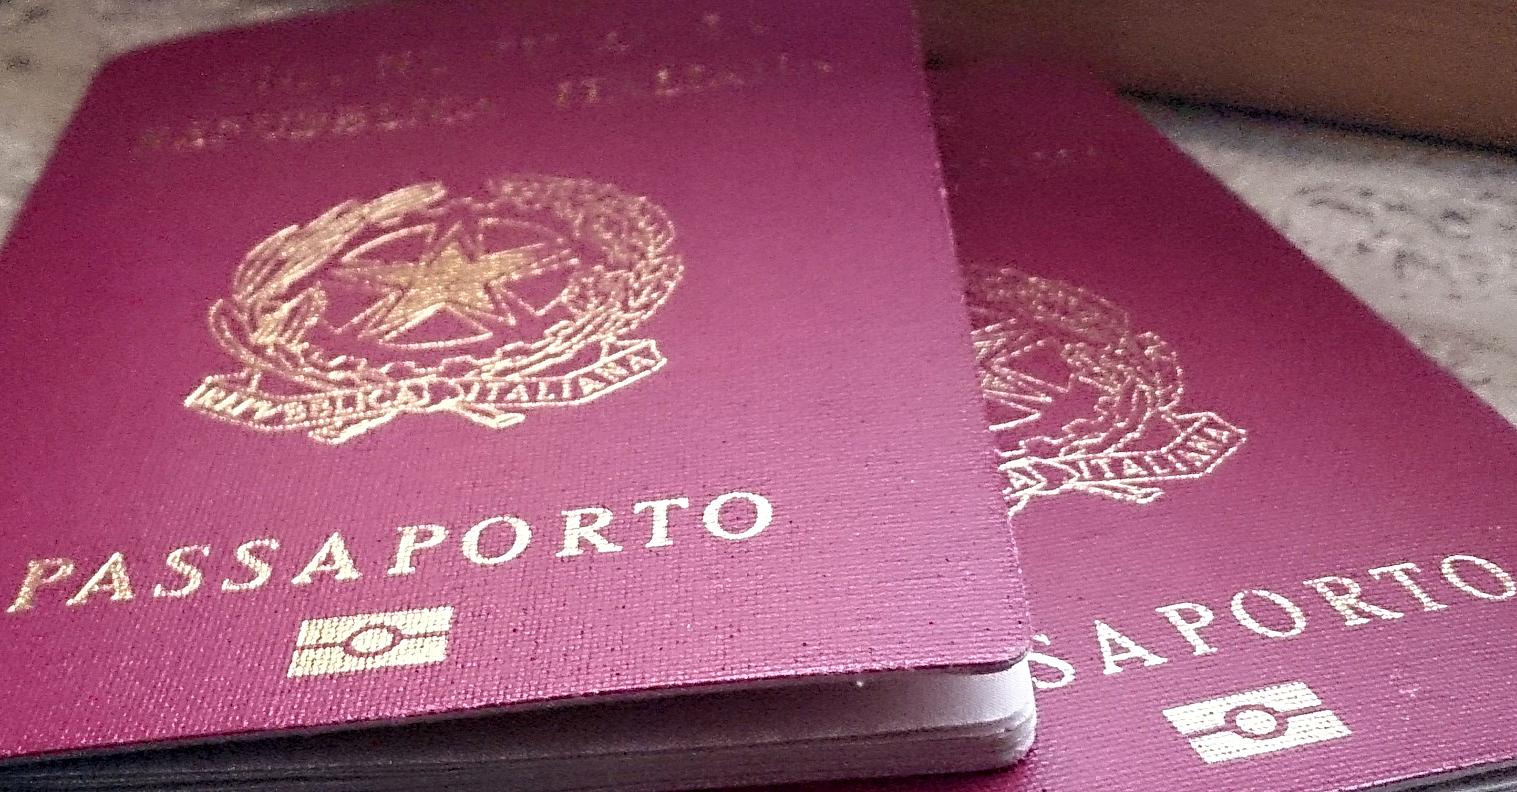 argentina passaporto italiano